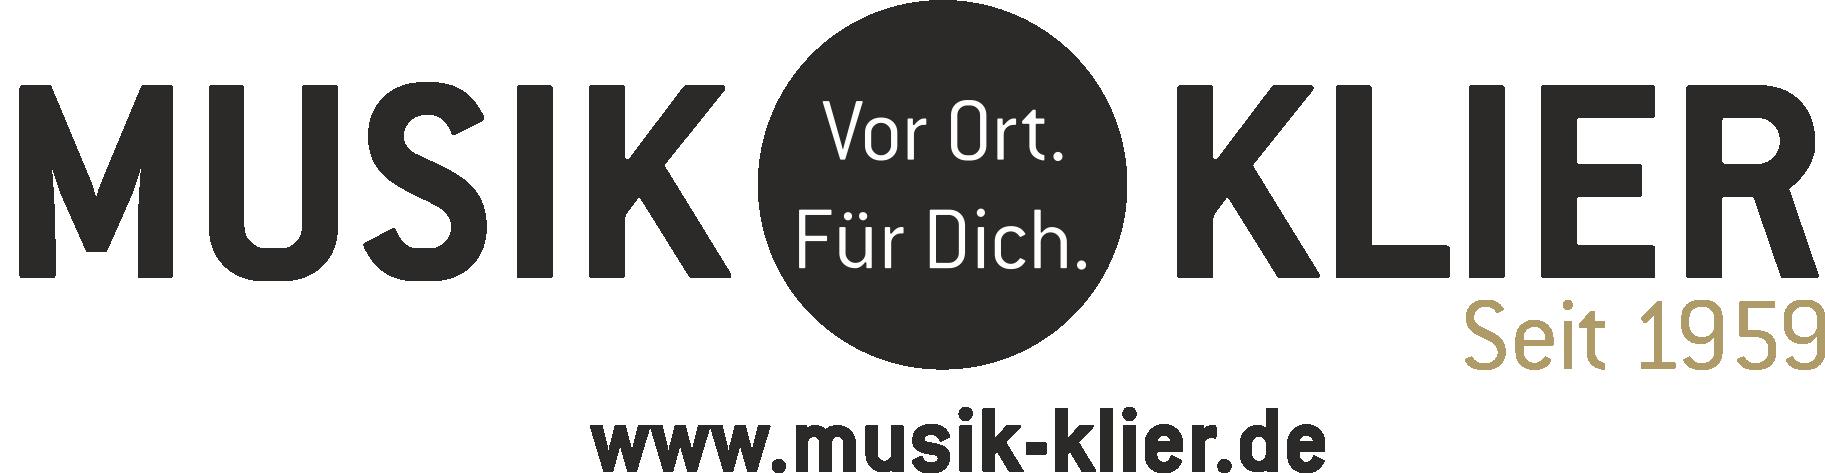 Musik Klier